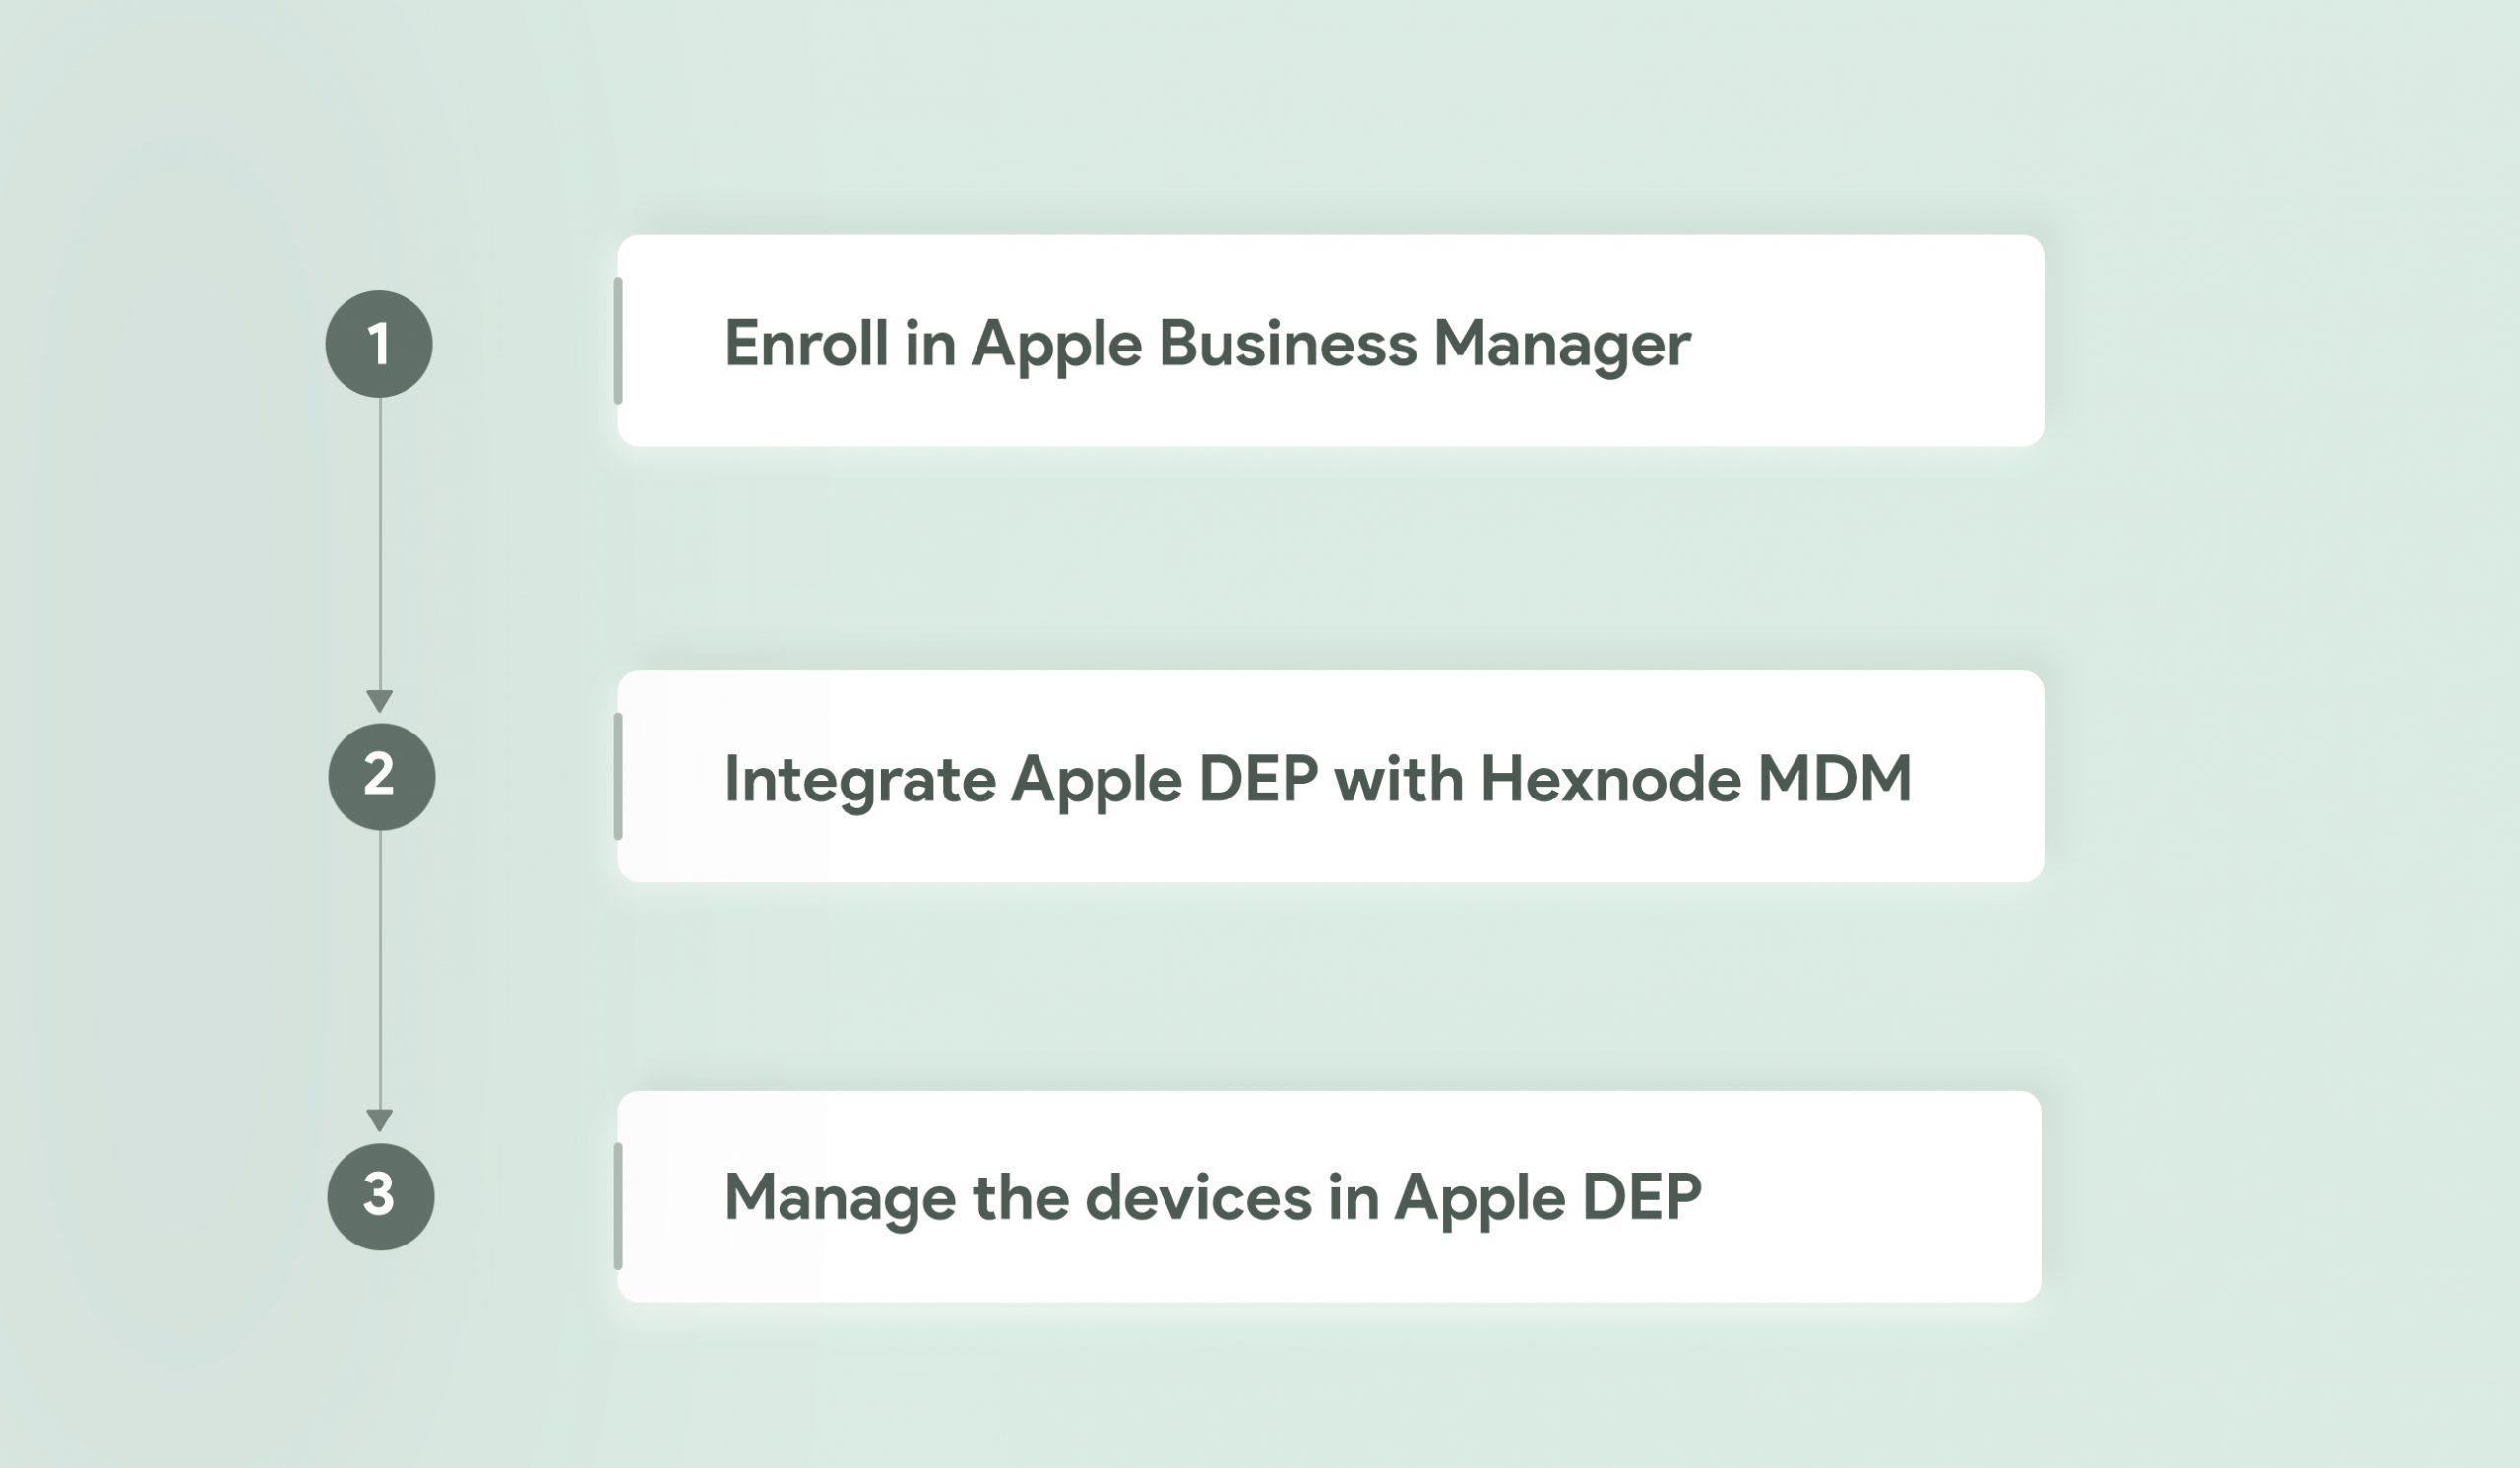 Steps involved in enrolling devices via DEP